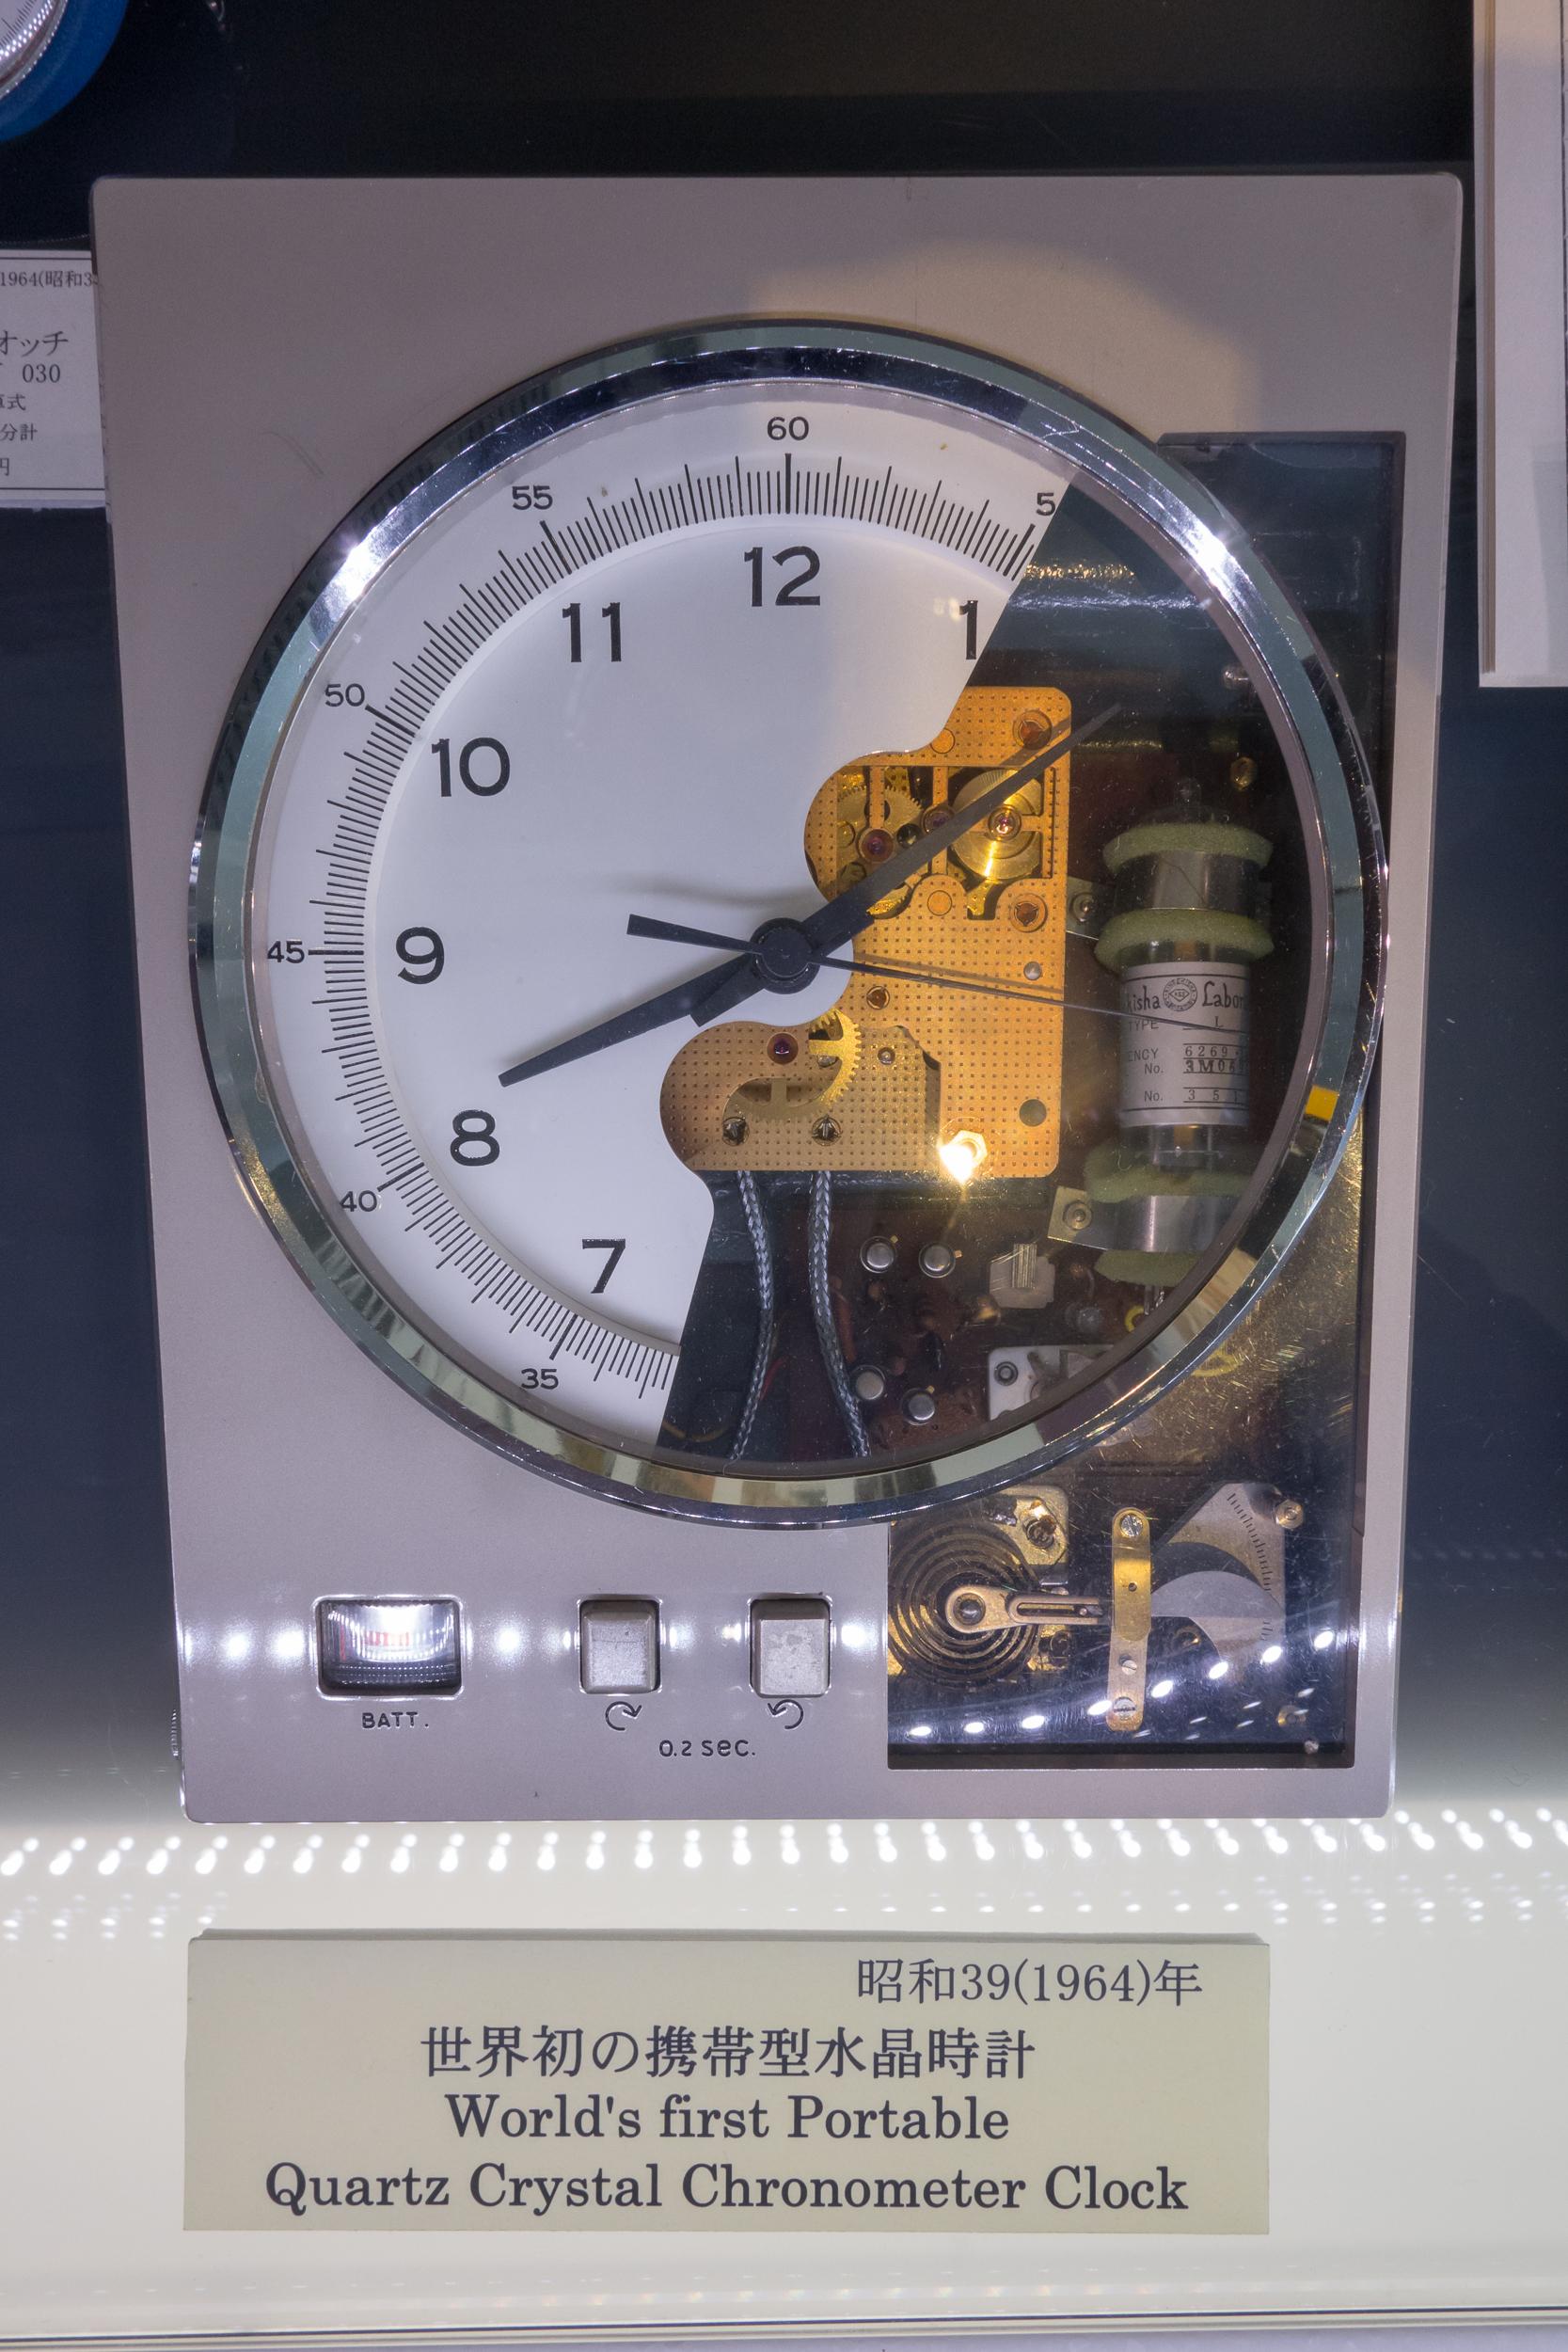 Crystal Chronometer Cut Away